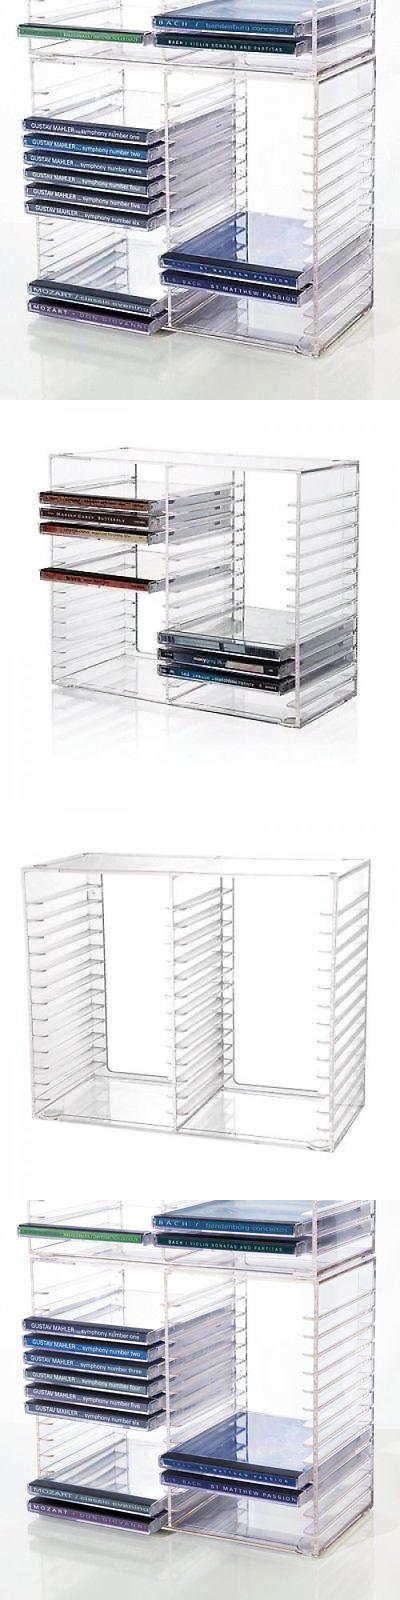 Storage Rack CD 30 Jewel Case Holder Stand Organizer Crystal Clear Shelf Decor